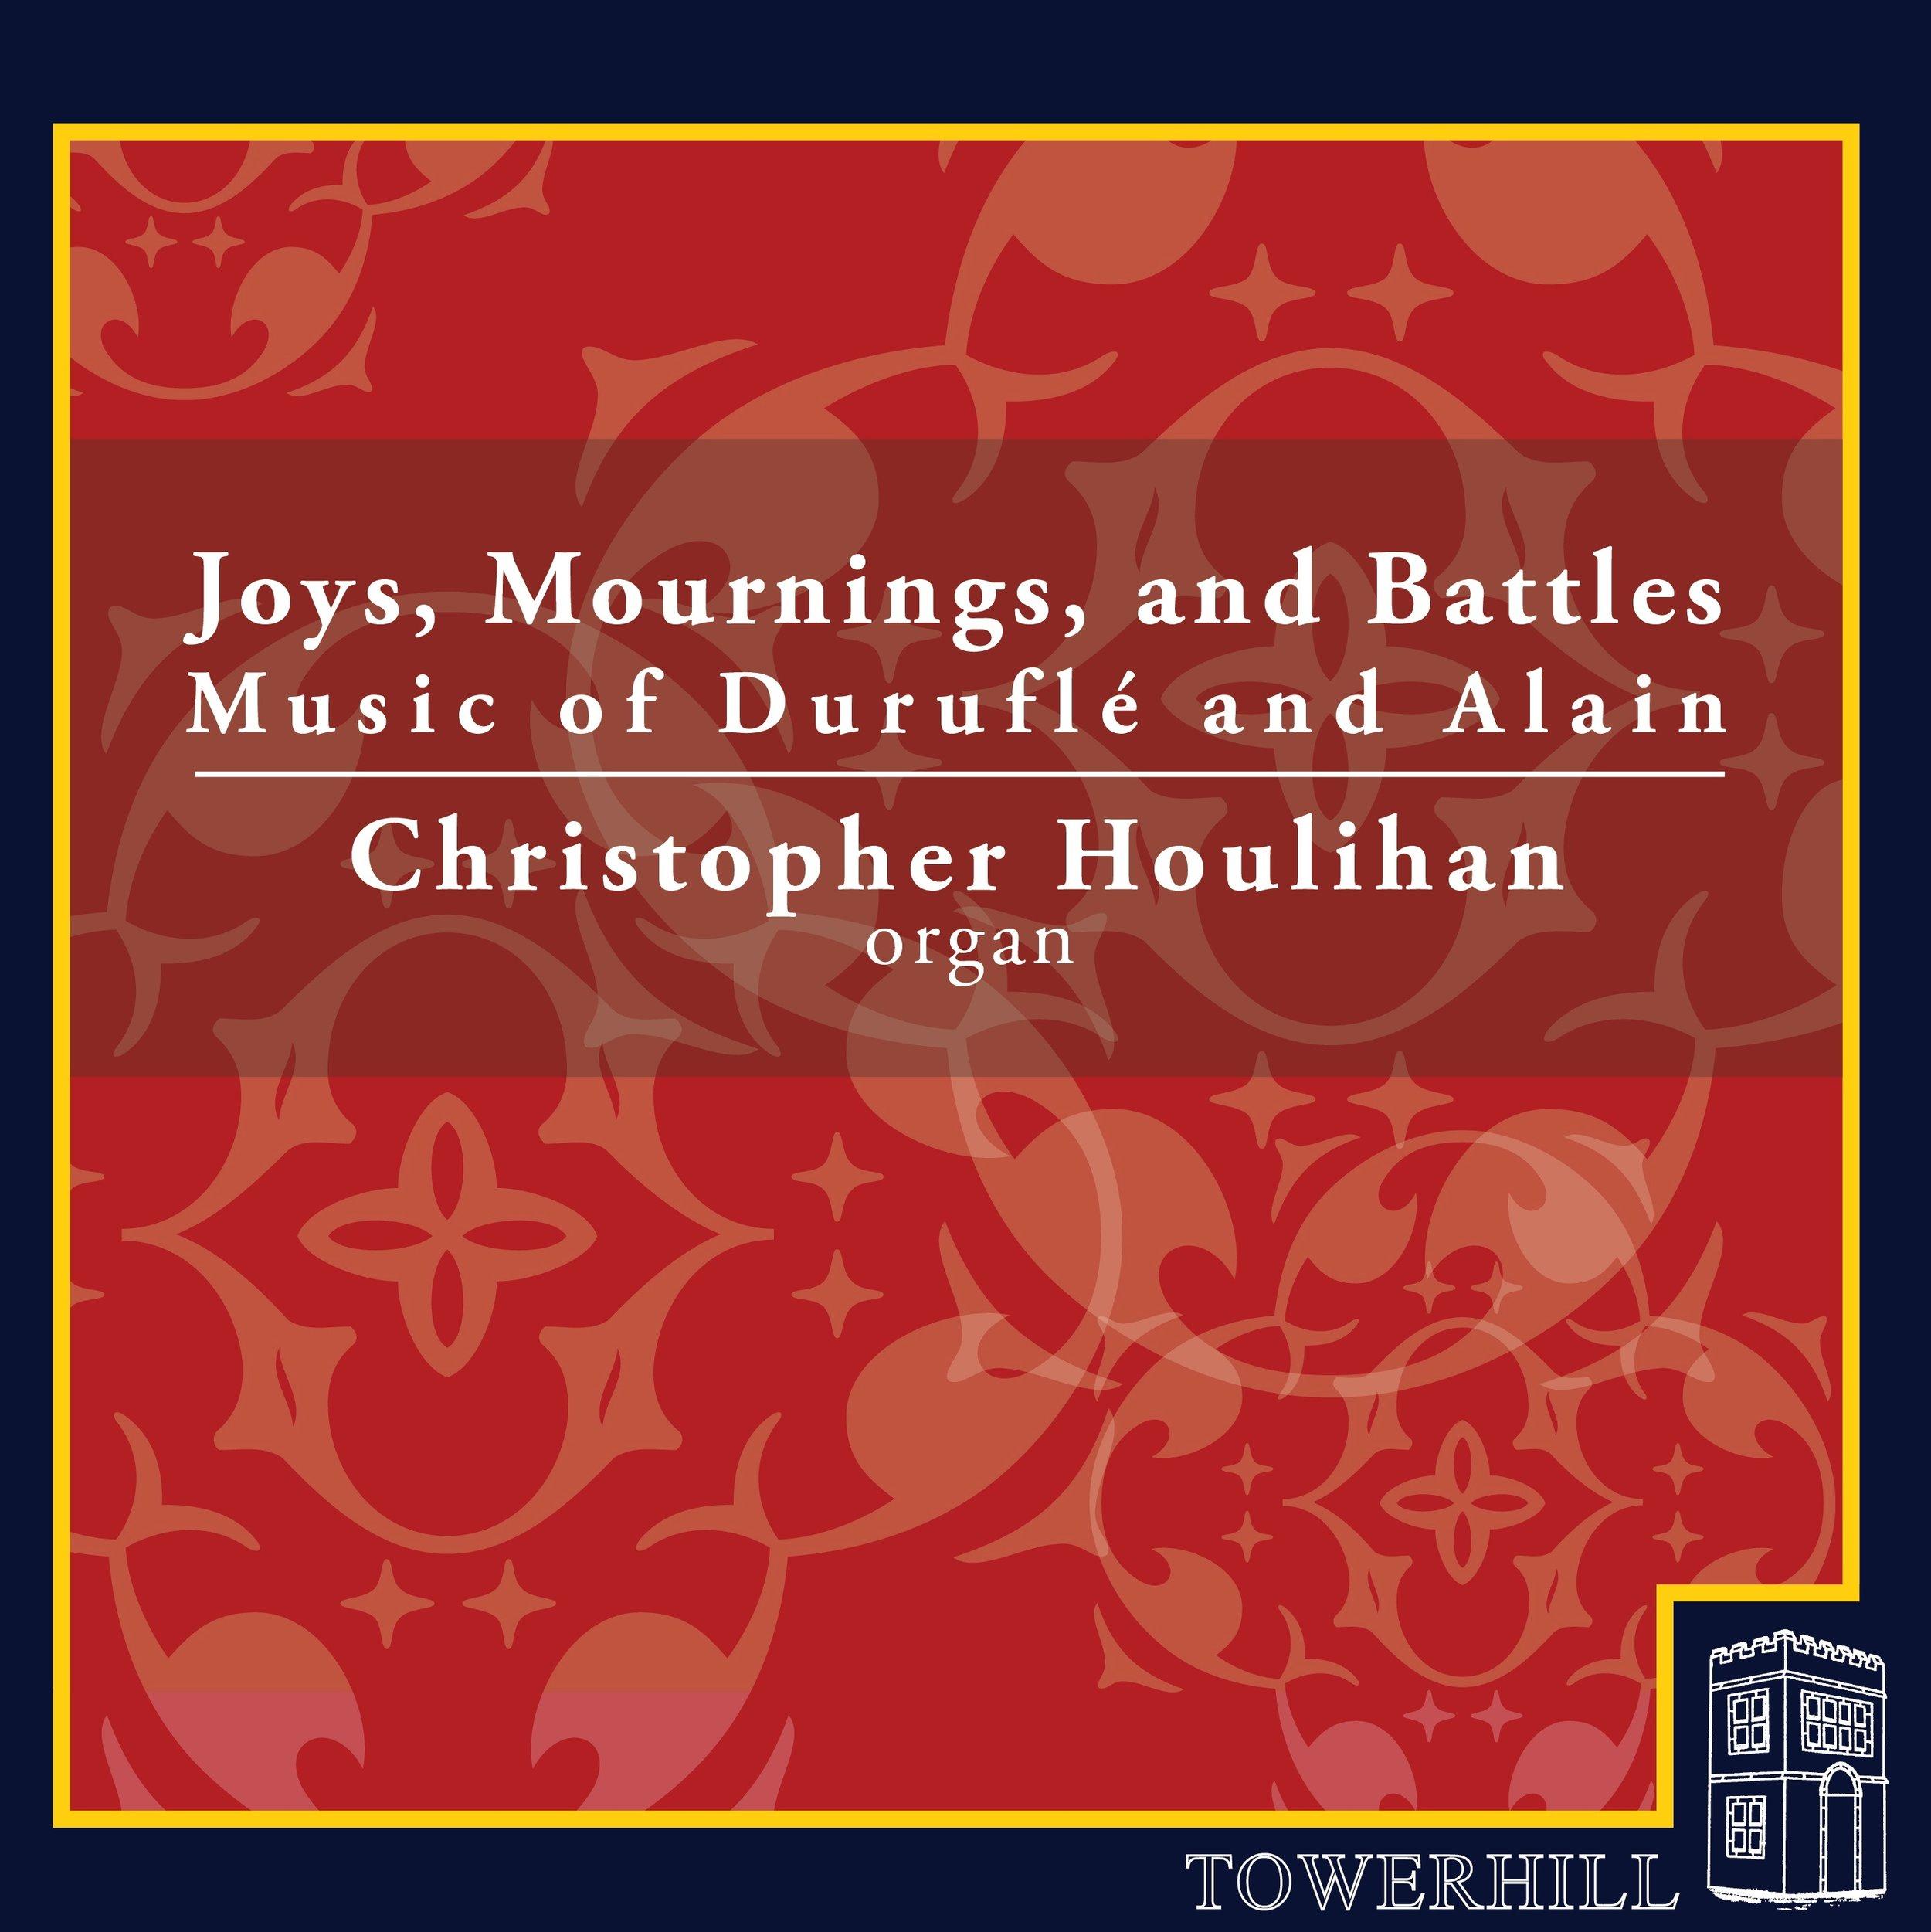 Towerhill Recordings (2010)